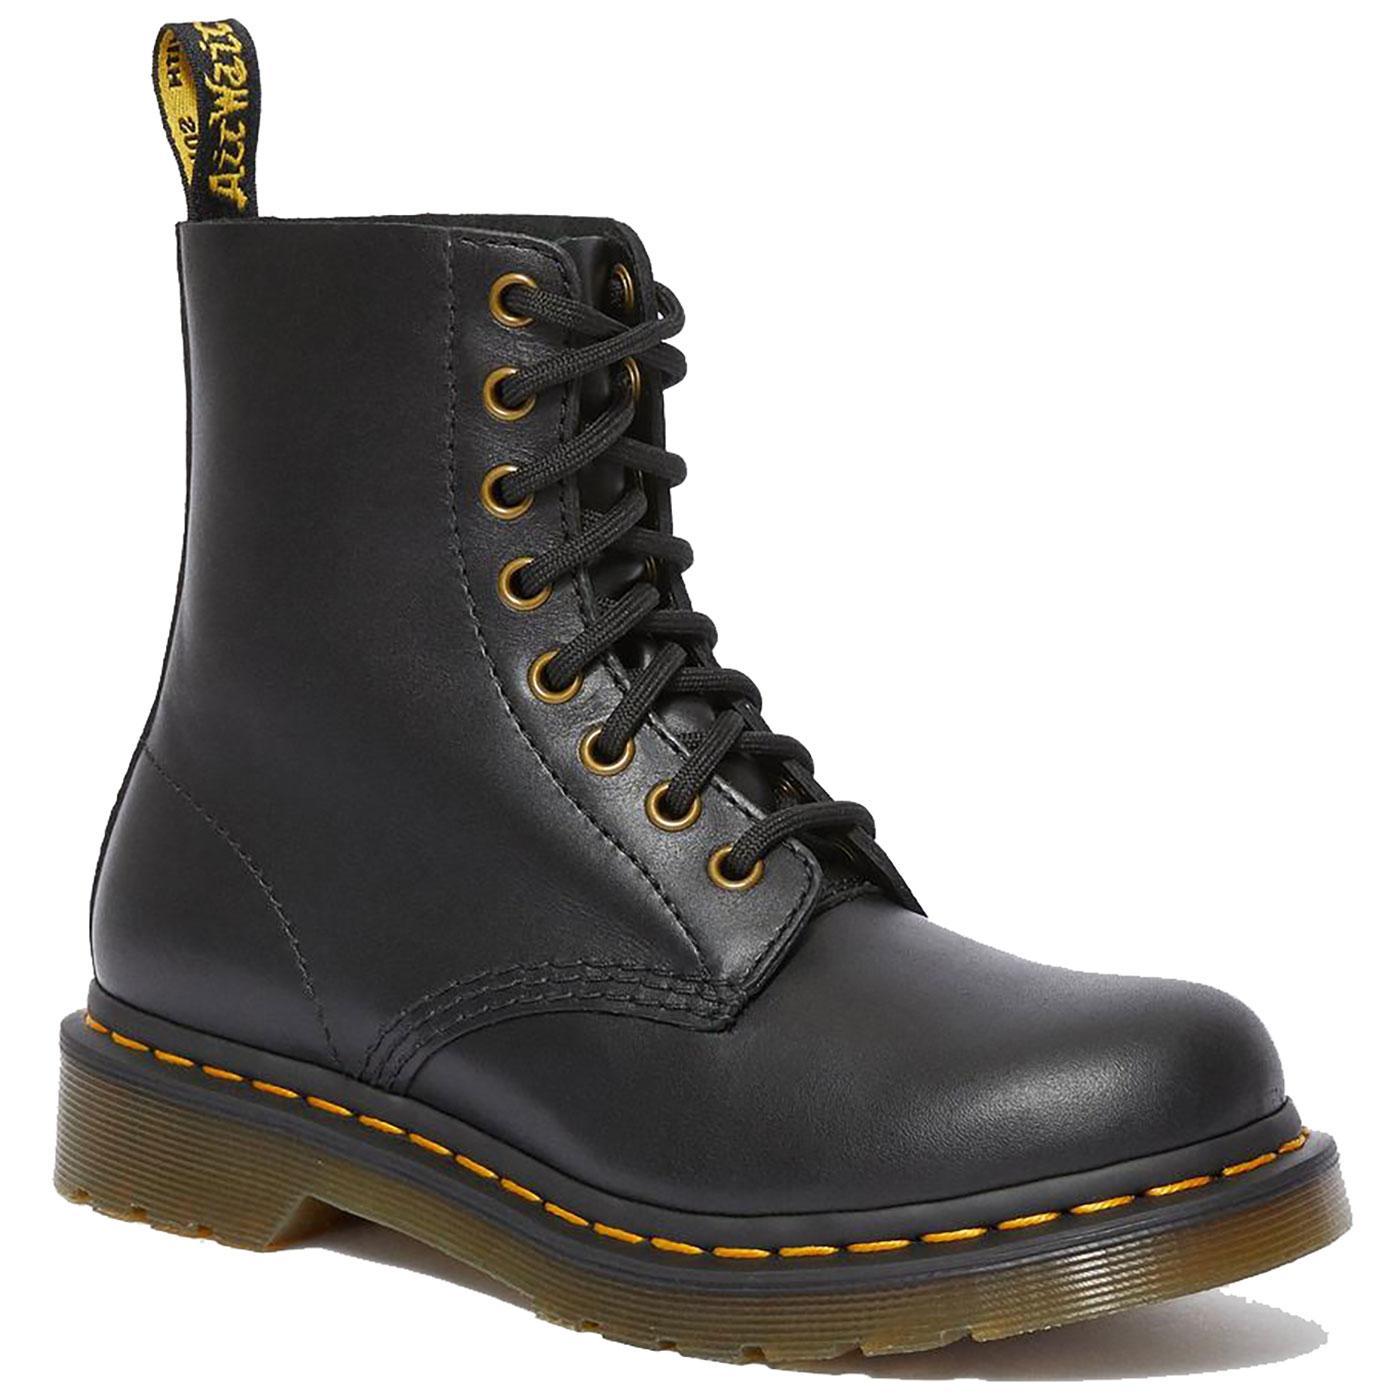 1460 Pascal Wanama DR MARTENS Womens Retro Boots